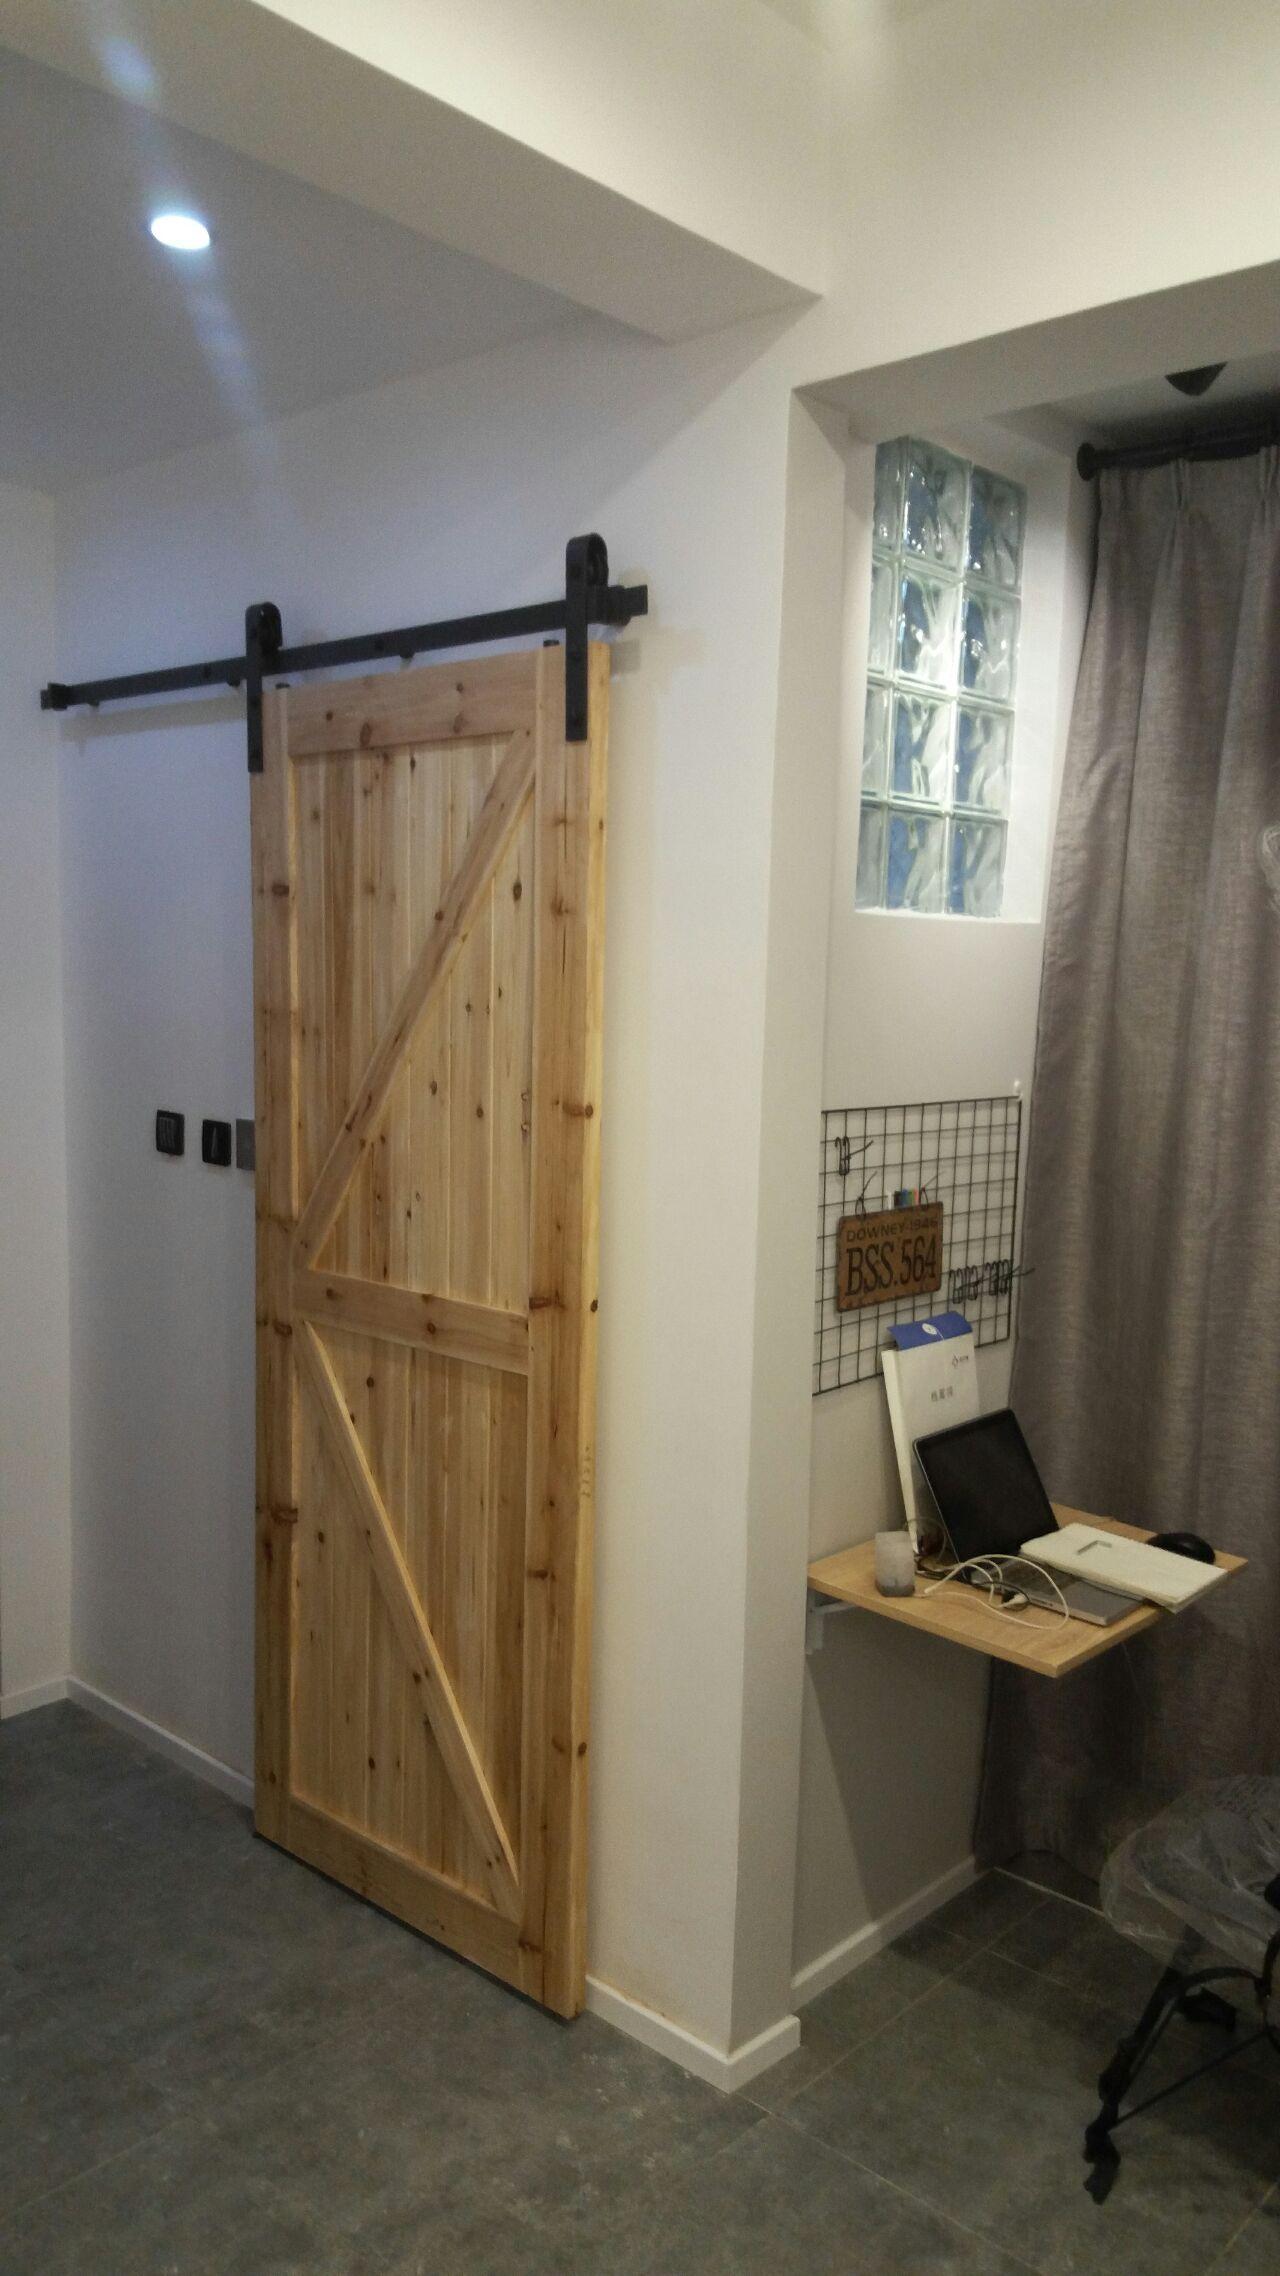 kitchen island dimensions natural pine cabinets 国内外有哪些处理家居小空间的经典案例? - 知乎